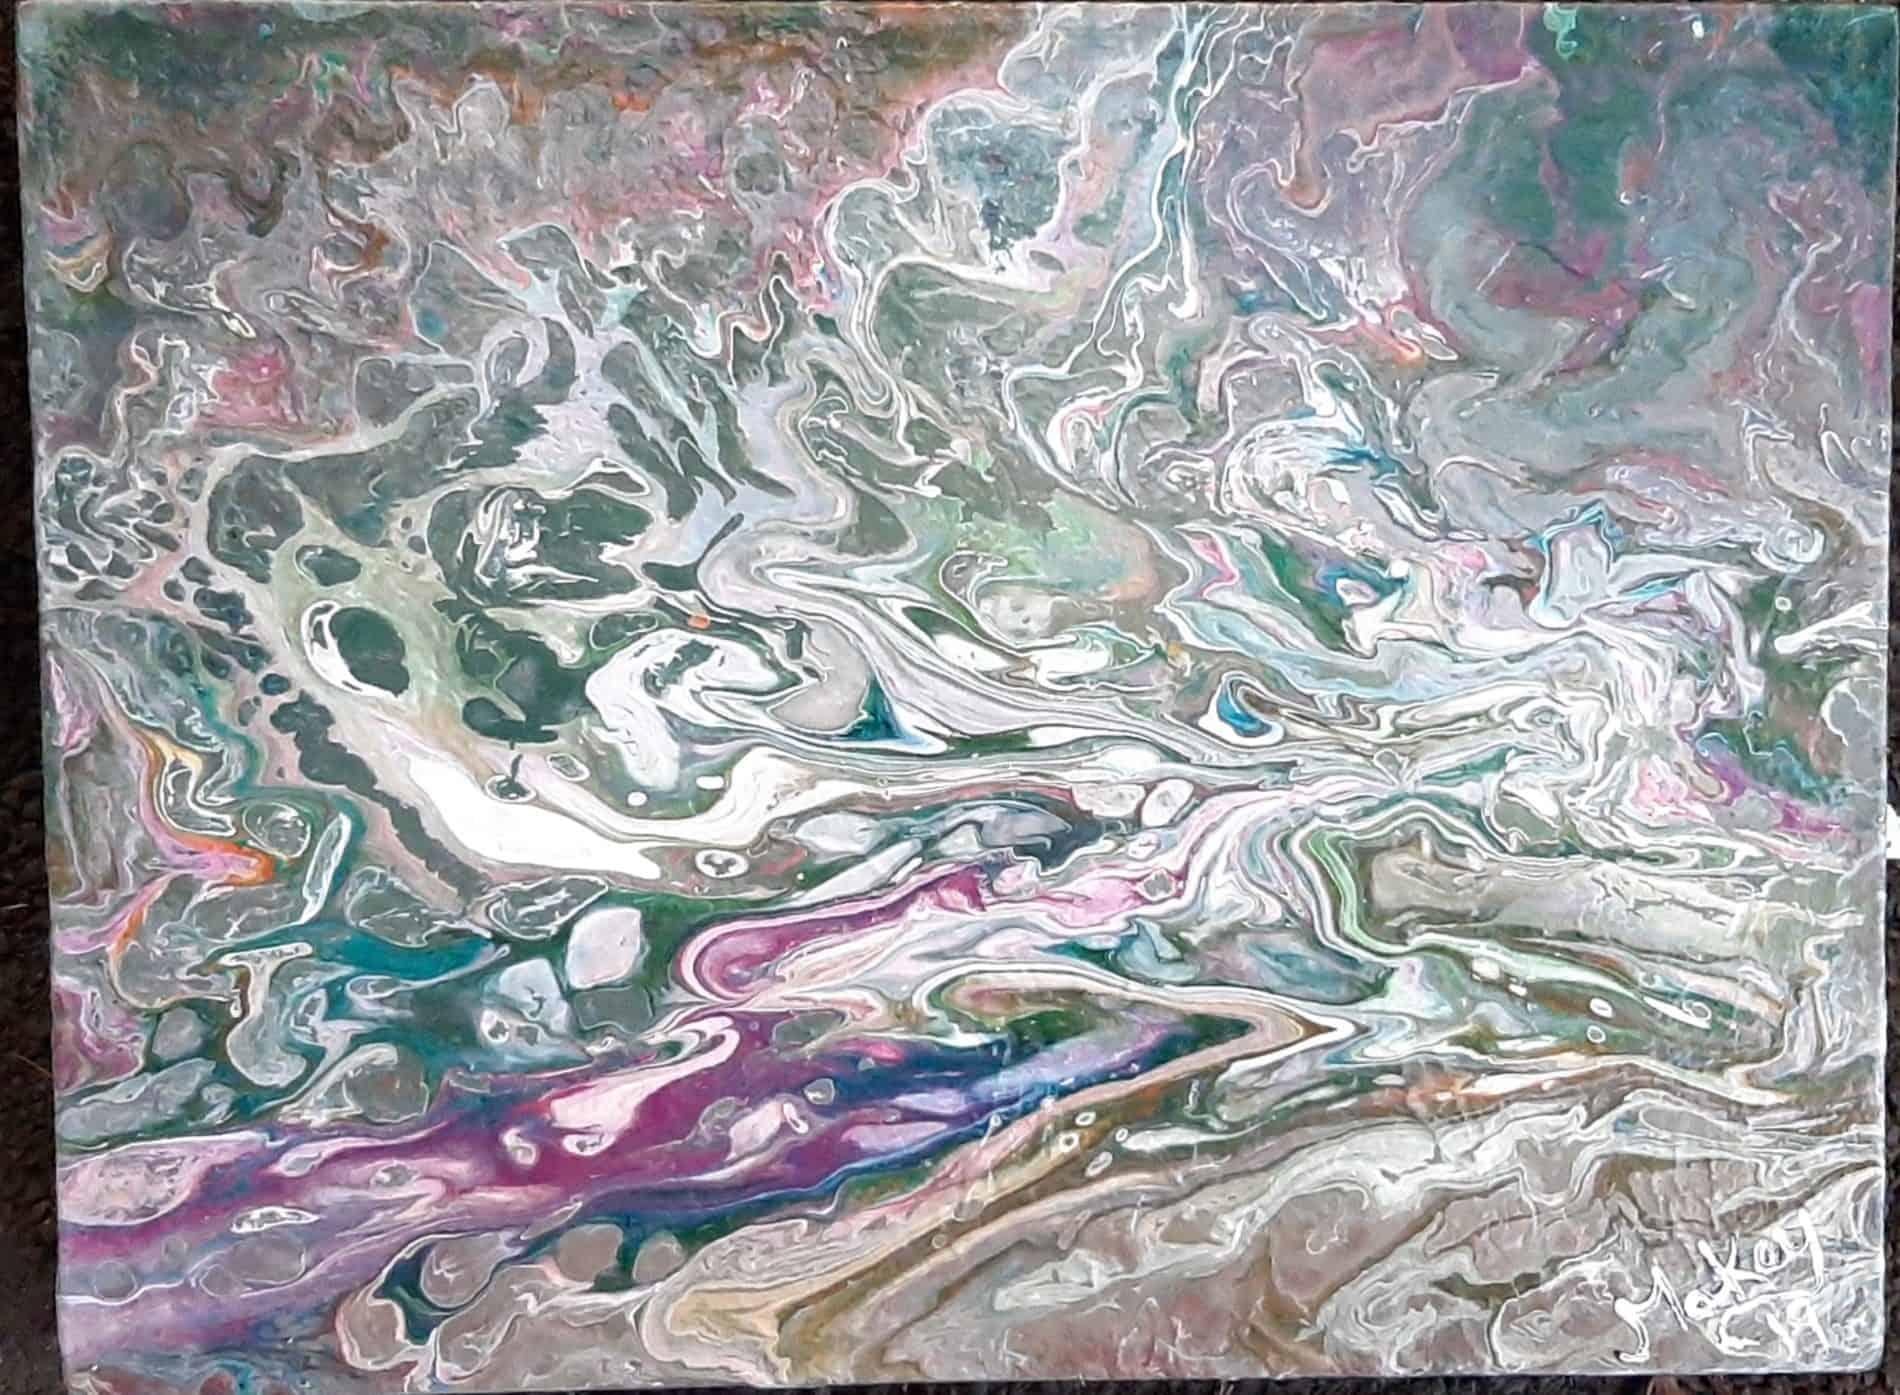 mauritian-artist-yusuf-makey-dark-side-of-the-moon